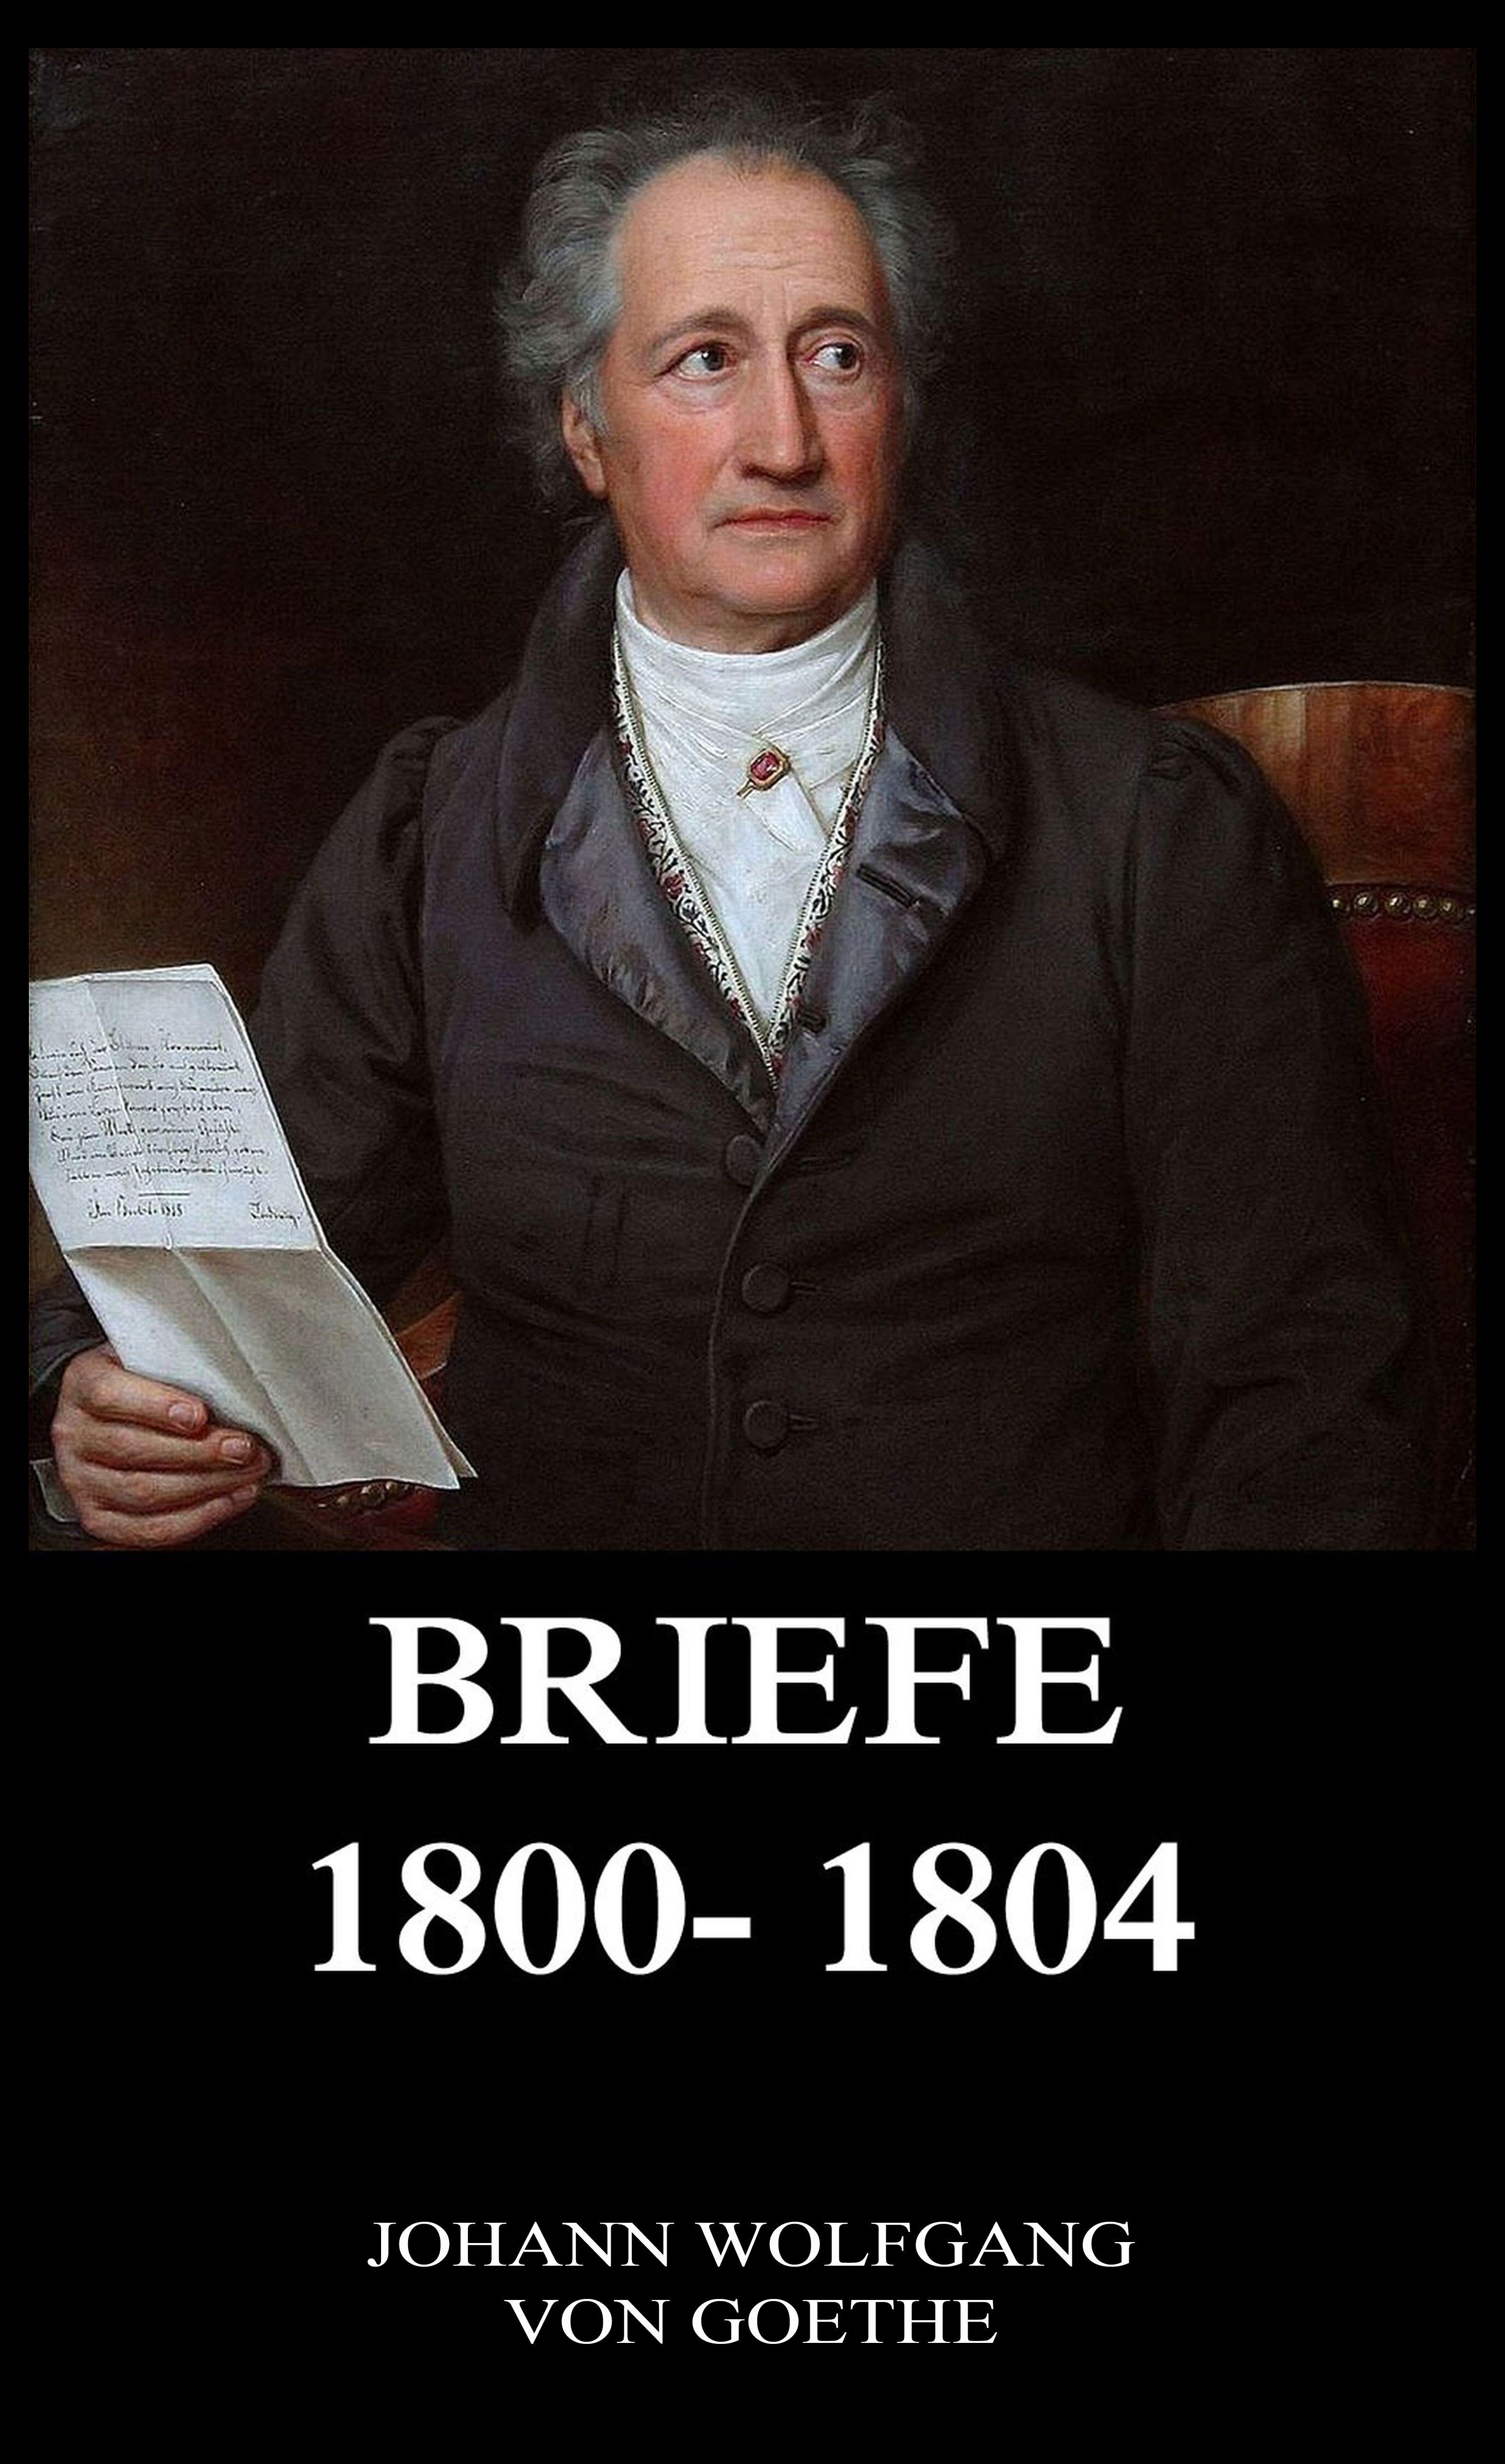 Briefe 1800 - 1804